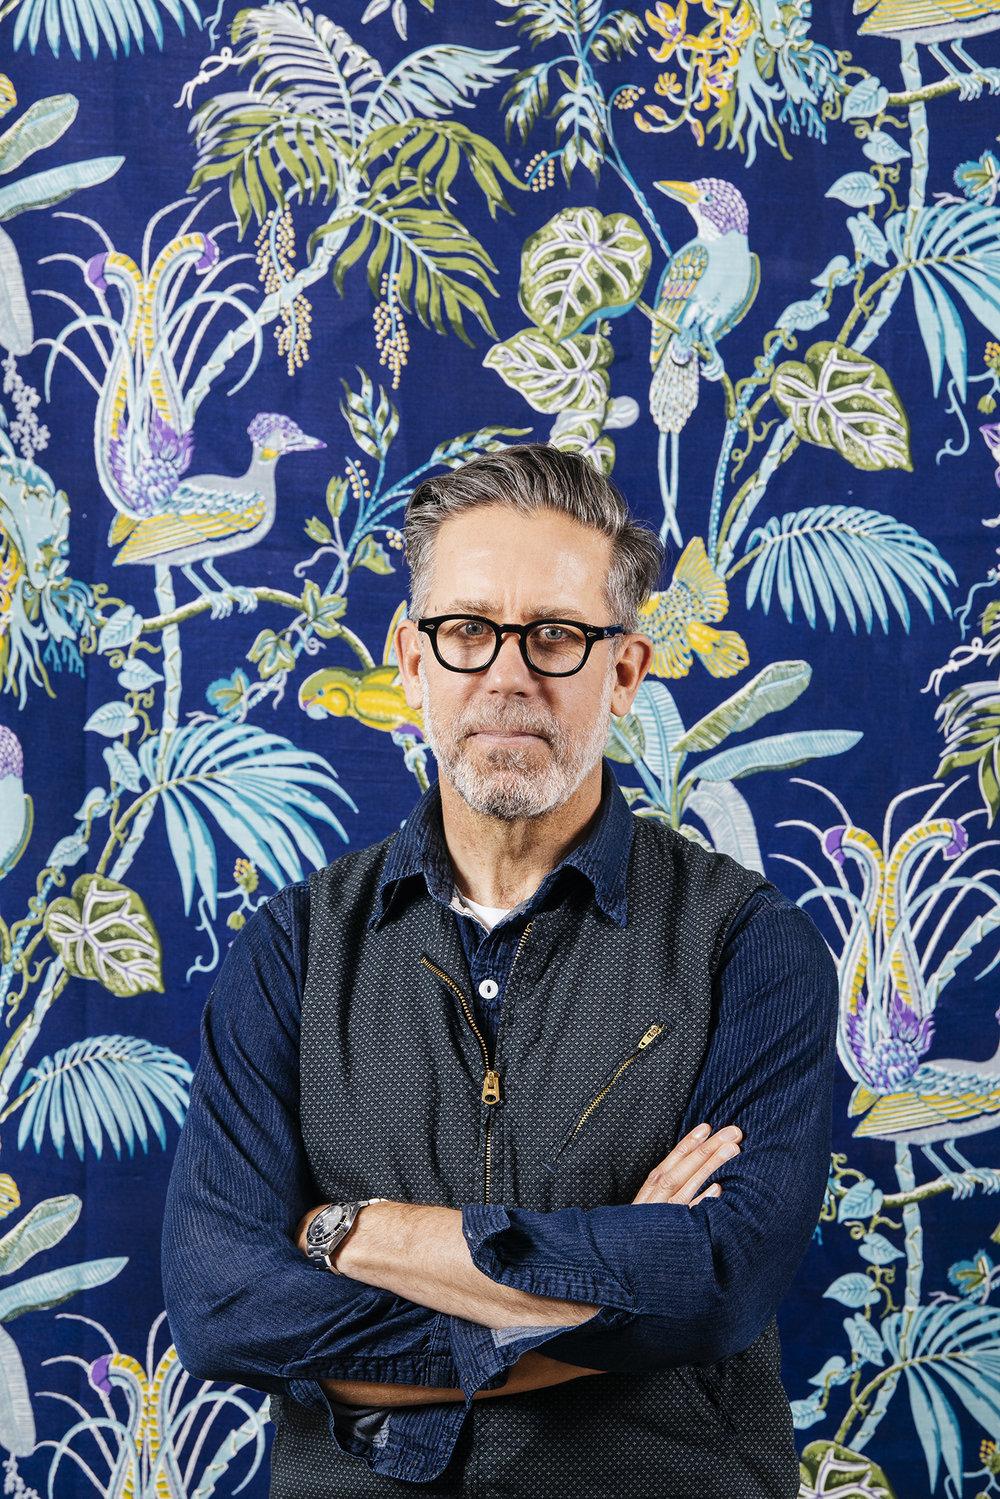 Textile artist Bruce Slorach